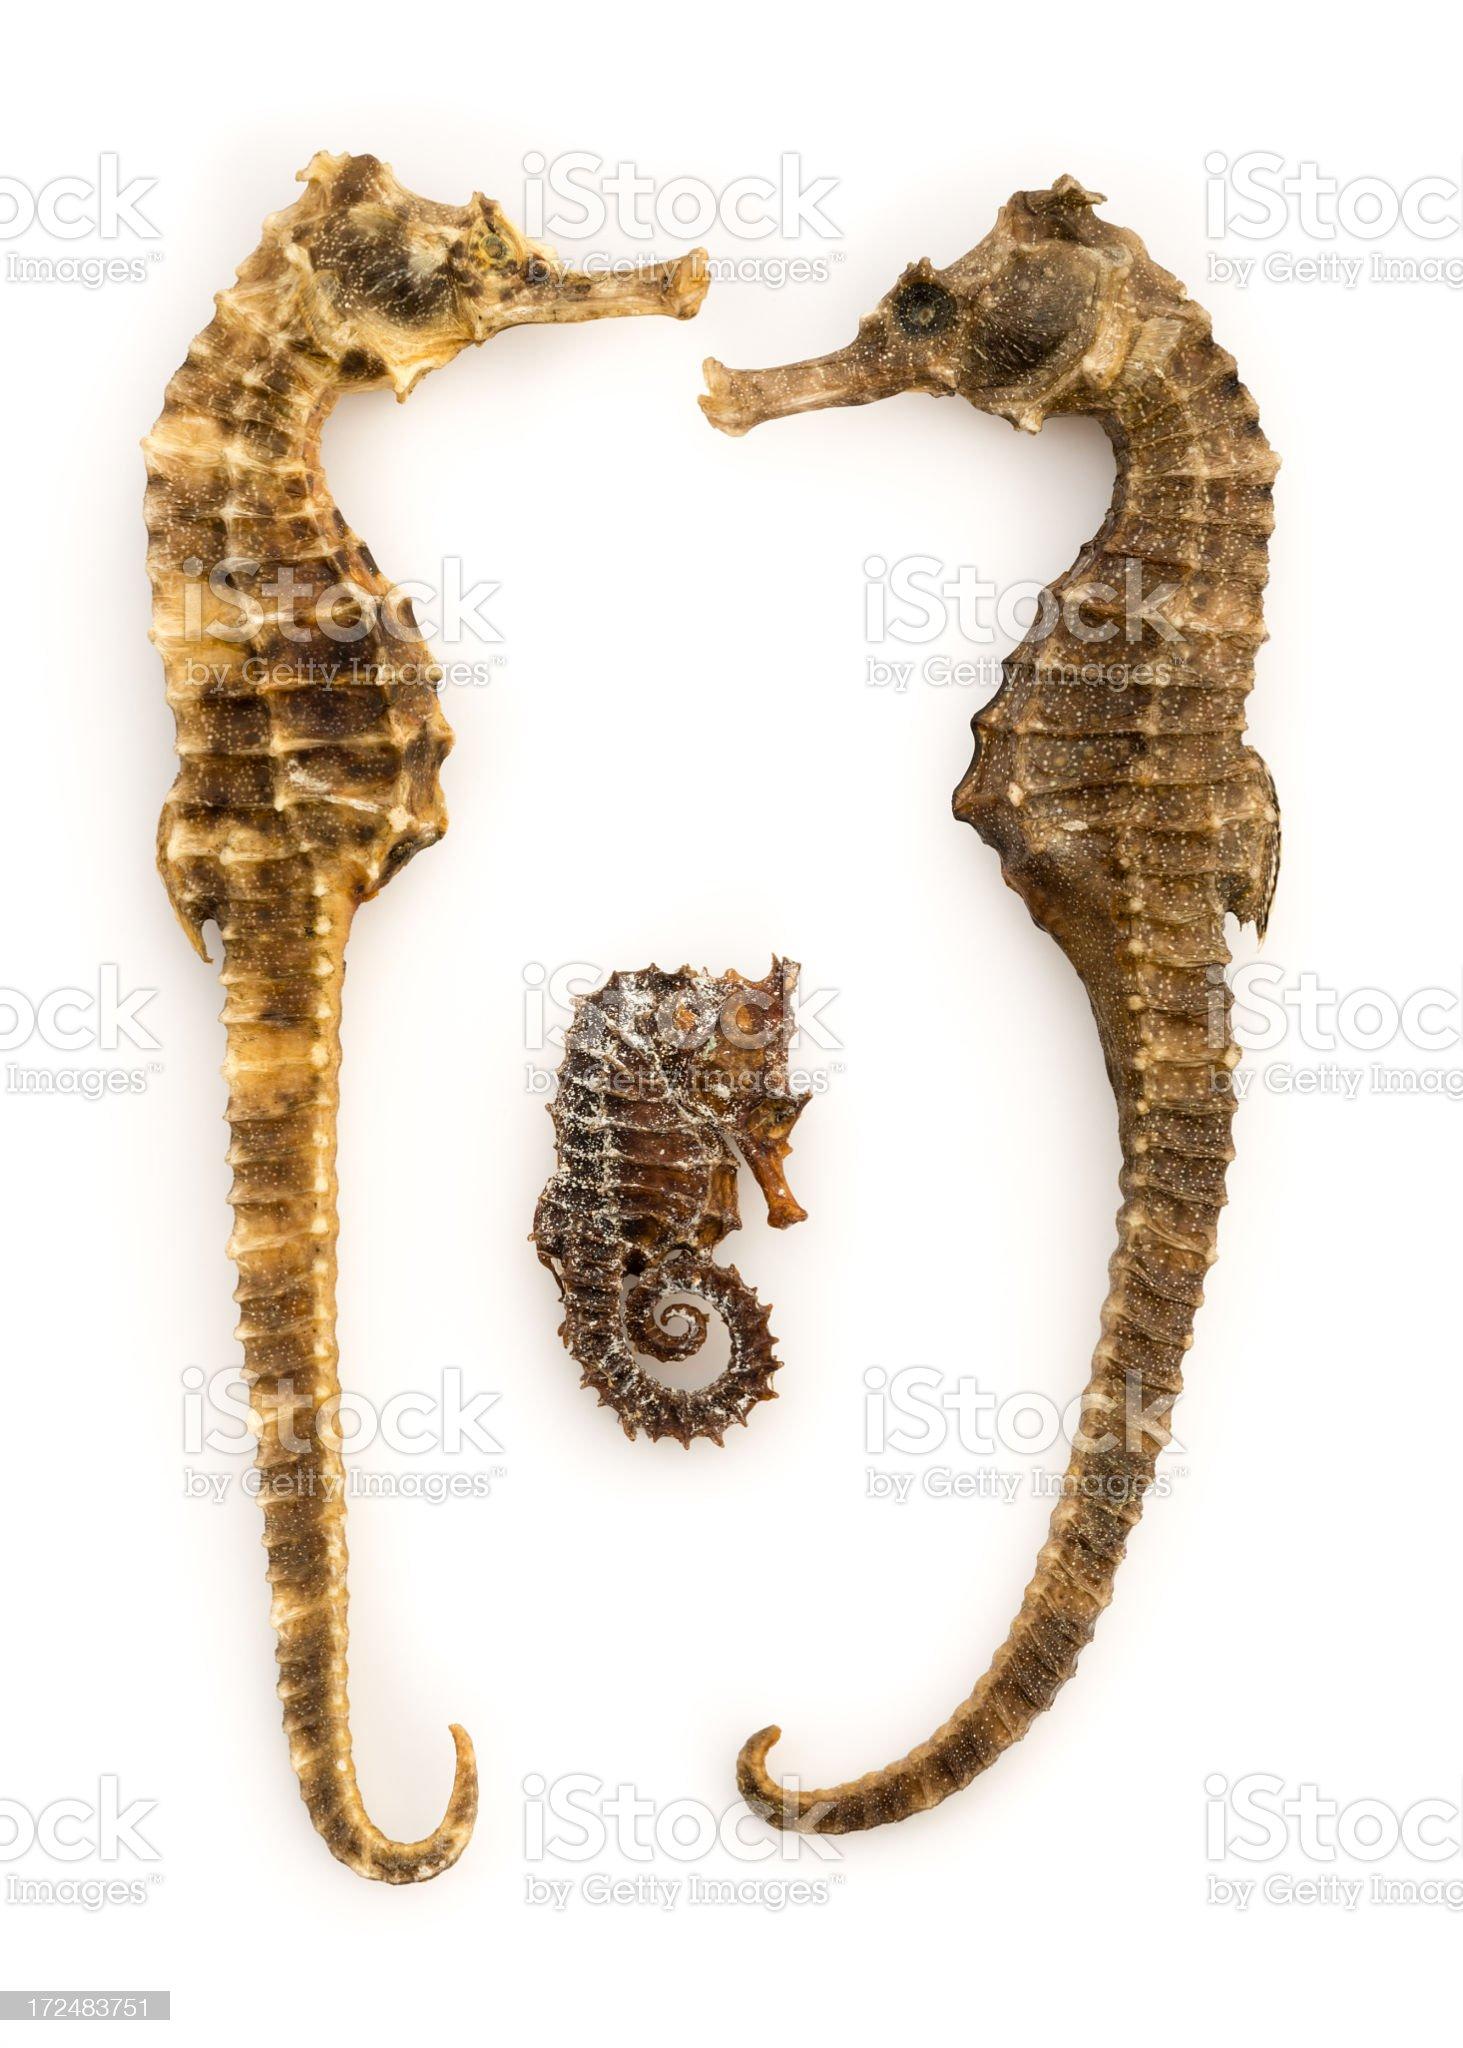 Seahorse royalty-free stock photo